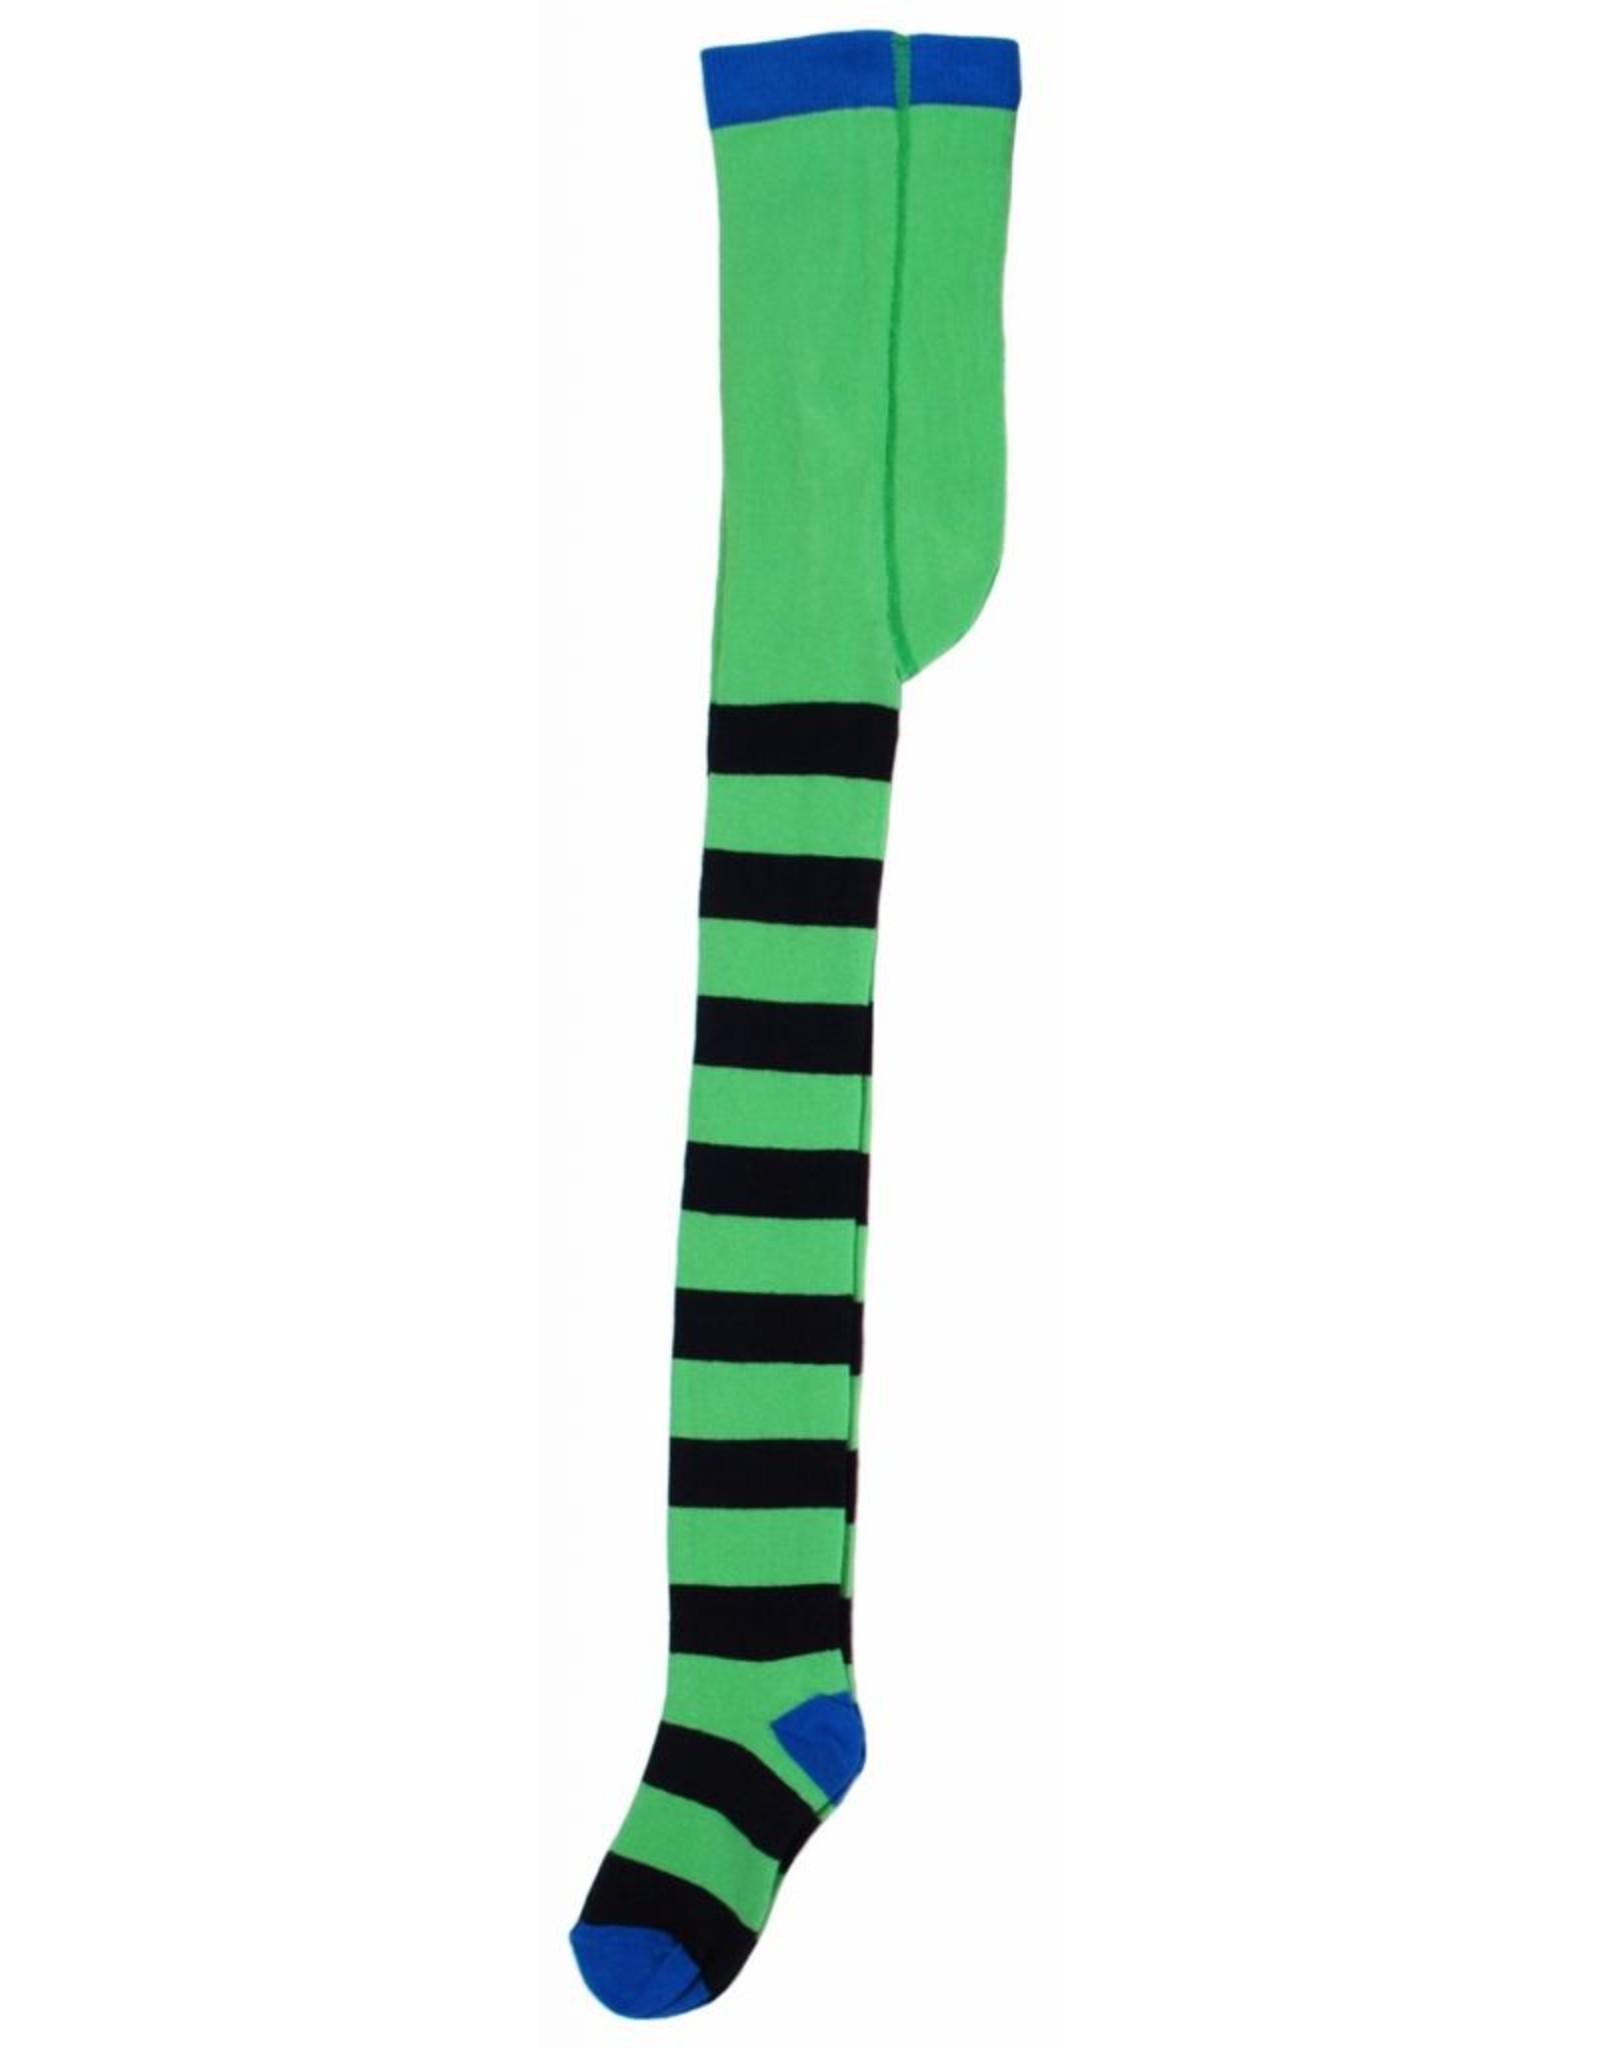 Duns Kinder maillots - groen blauw gestreept